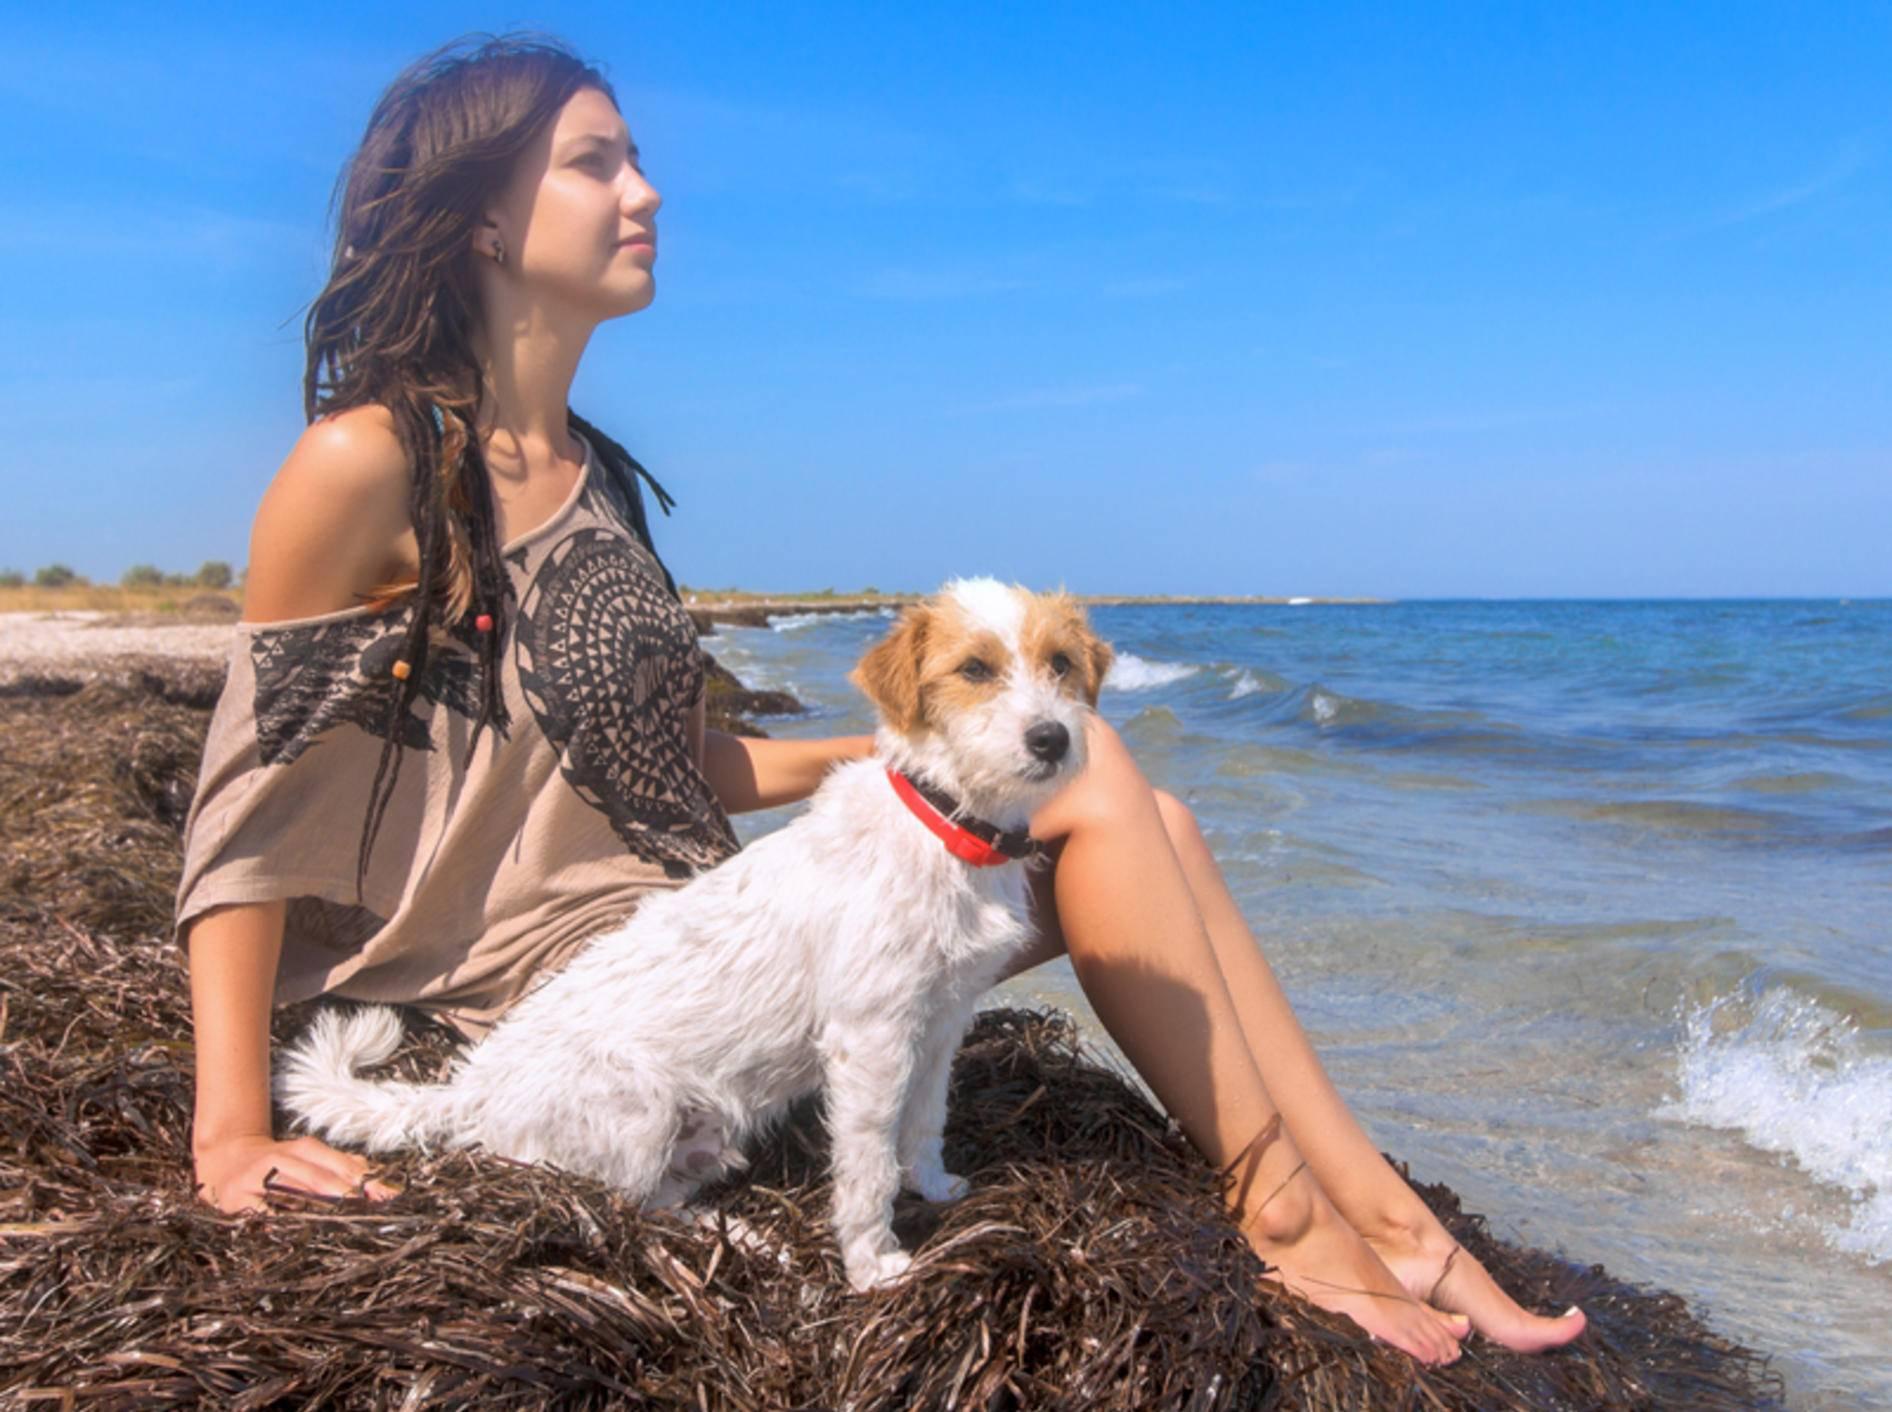 Wellness mit Hund am Strand, da ist Entspannung garantiert – Shutterstock / Sundays Photography